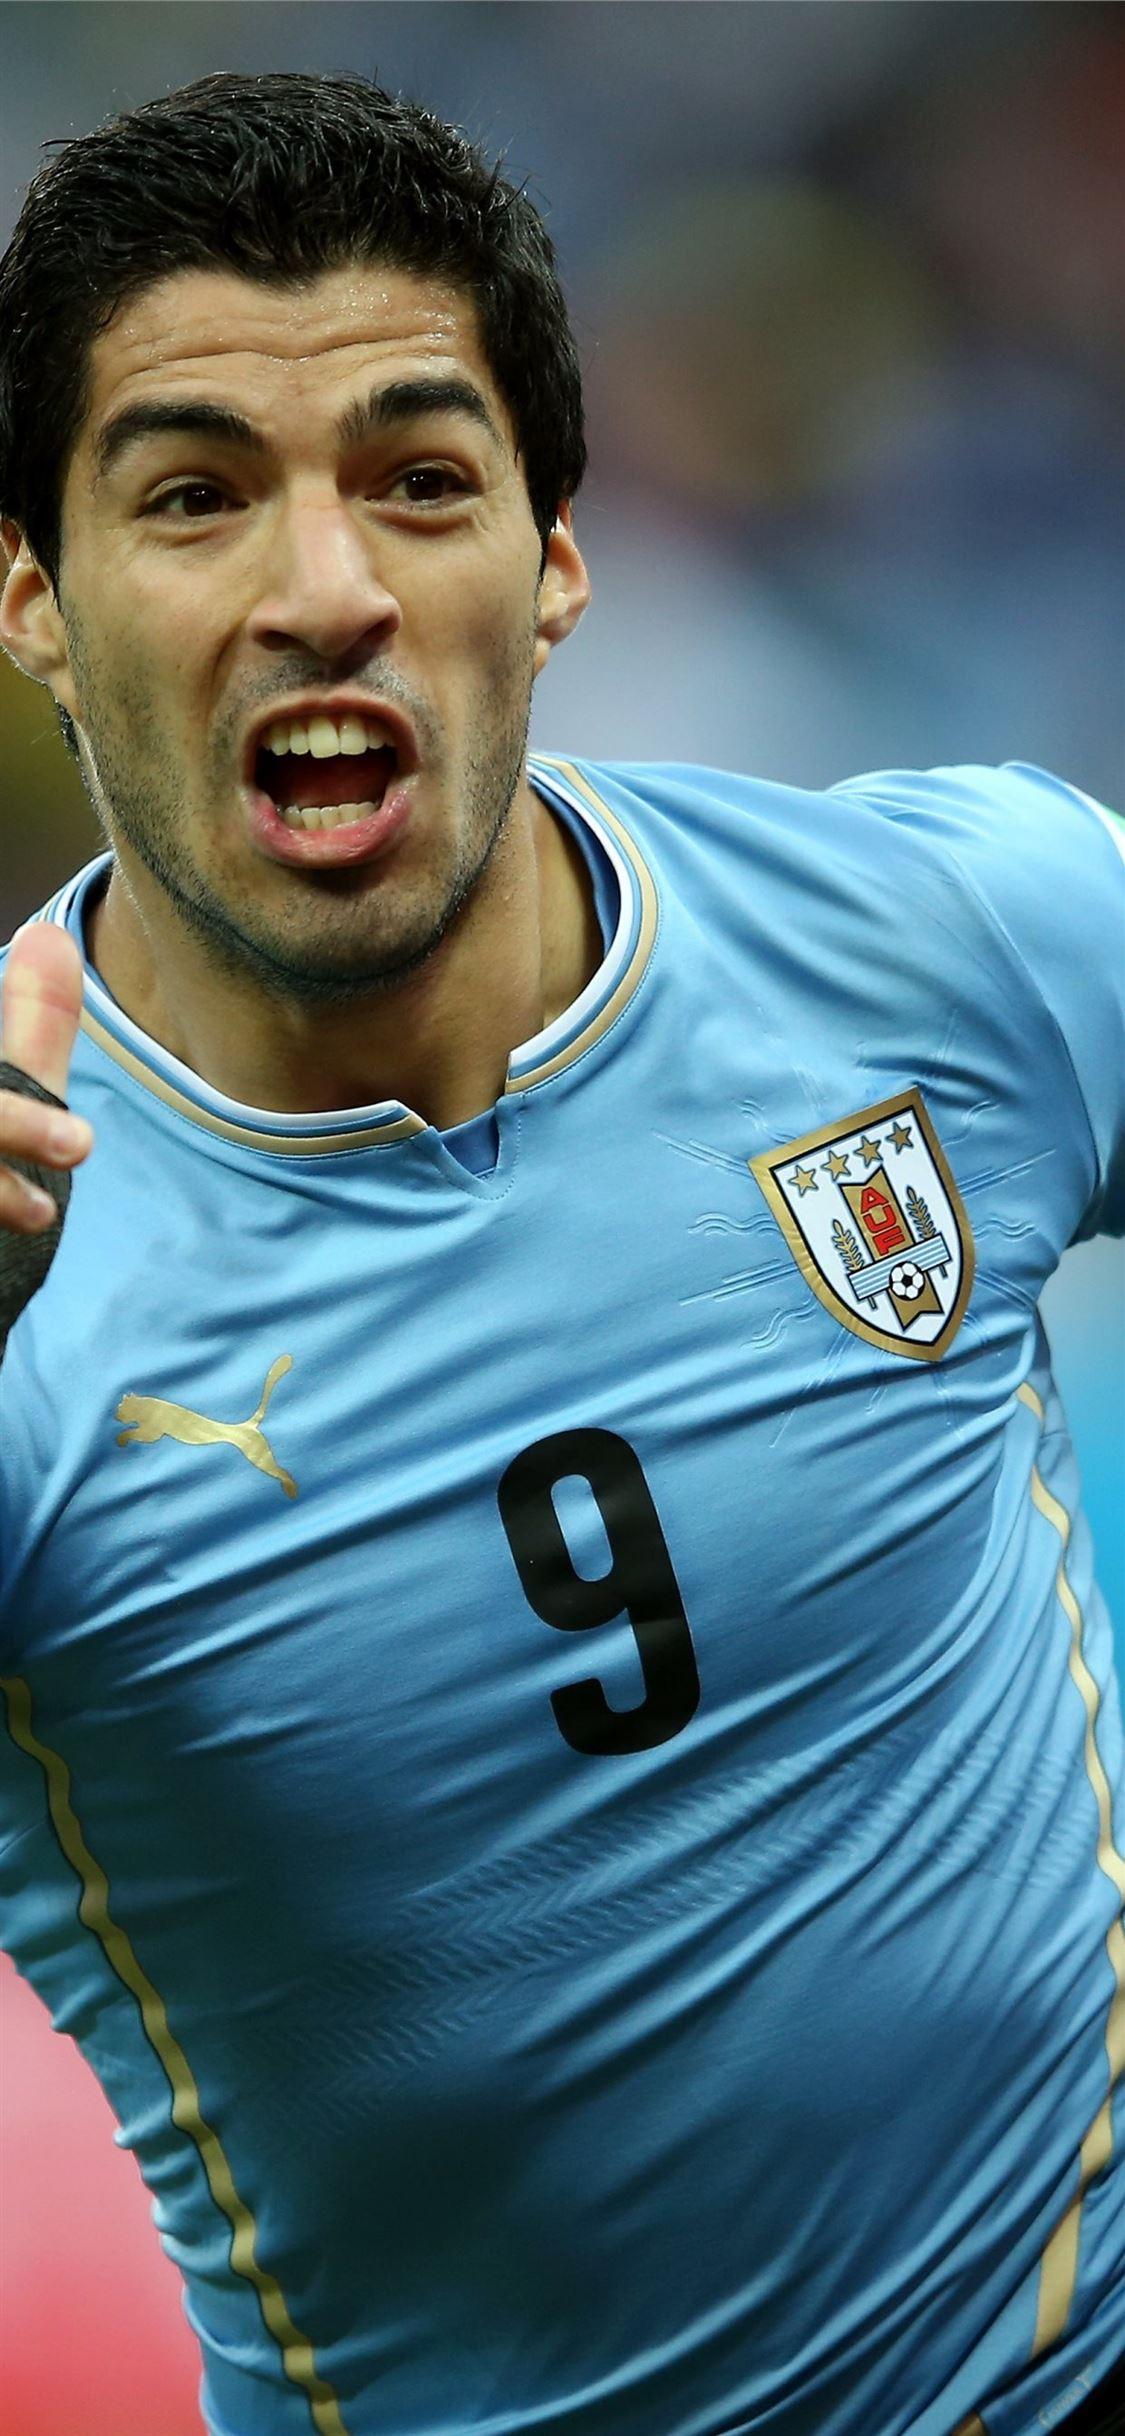 Luis Suarez Barcelona Fcb Soccer 4k Sport Iphone Wallpapers Free Download